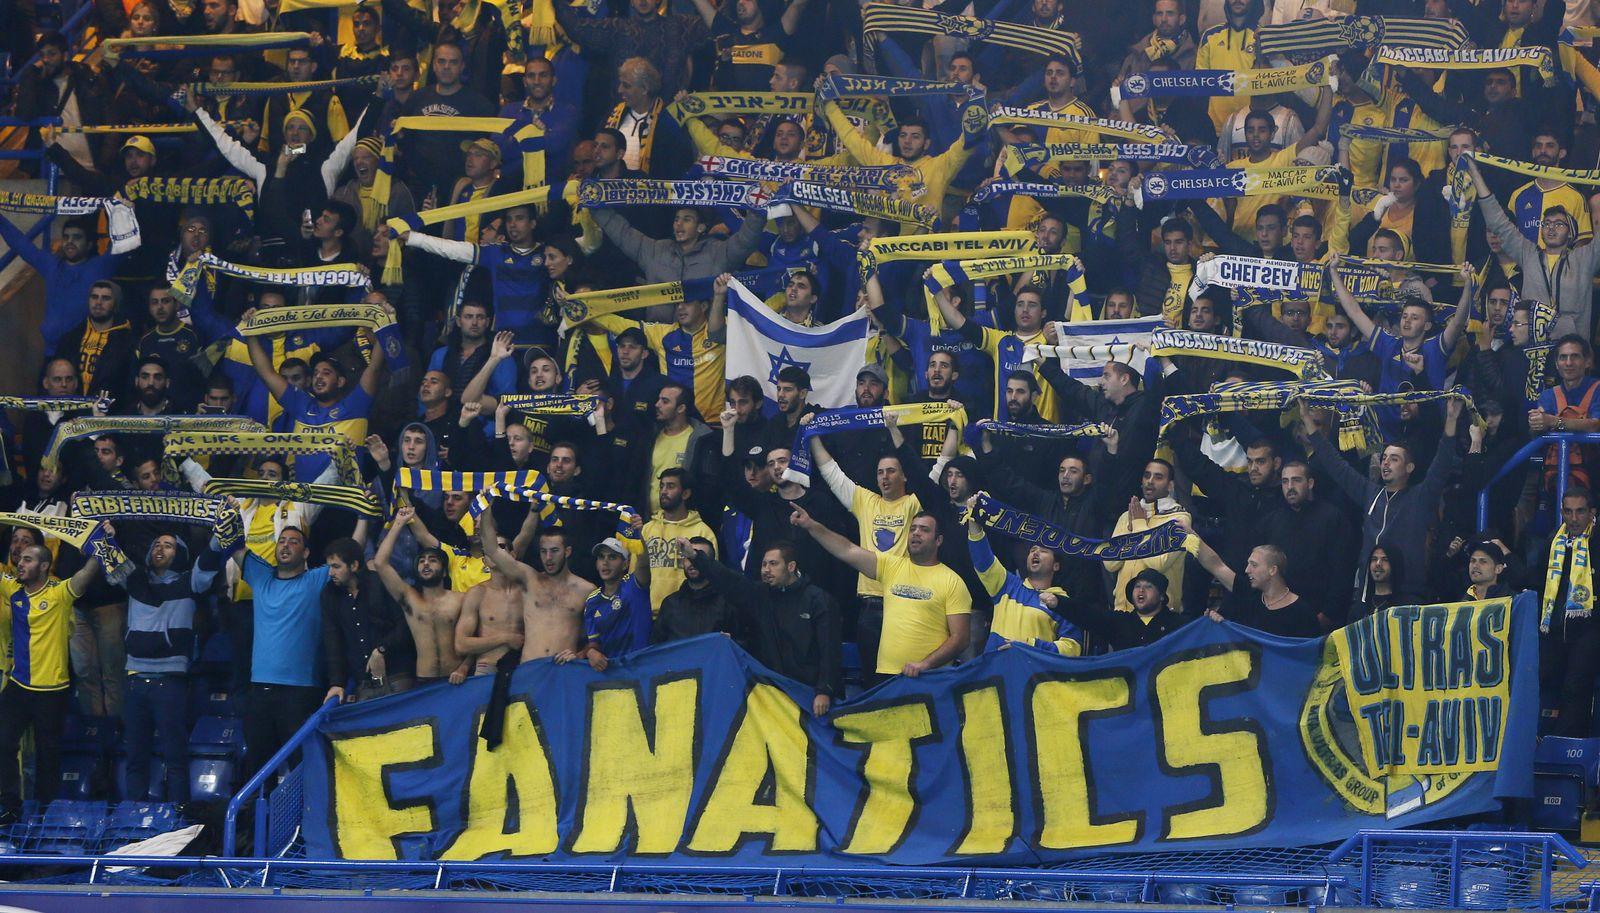 Maccabi Tel Aviv / Fans